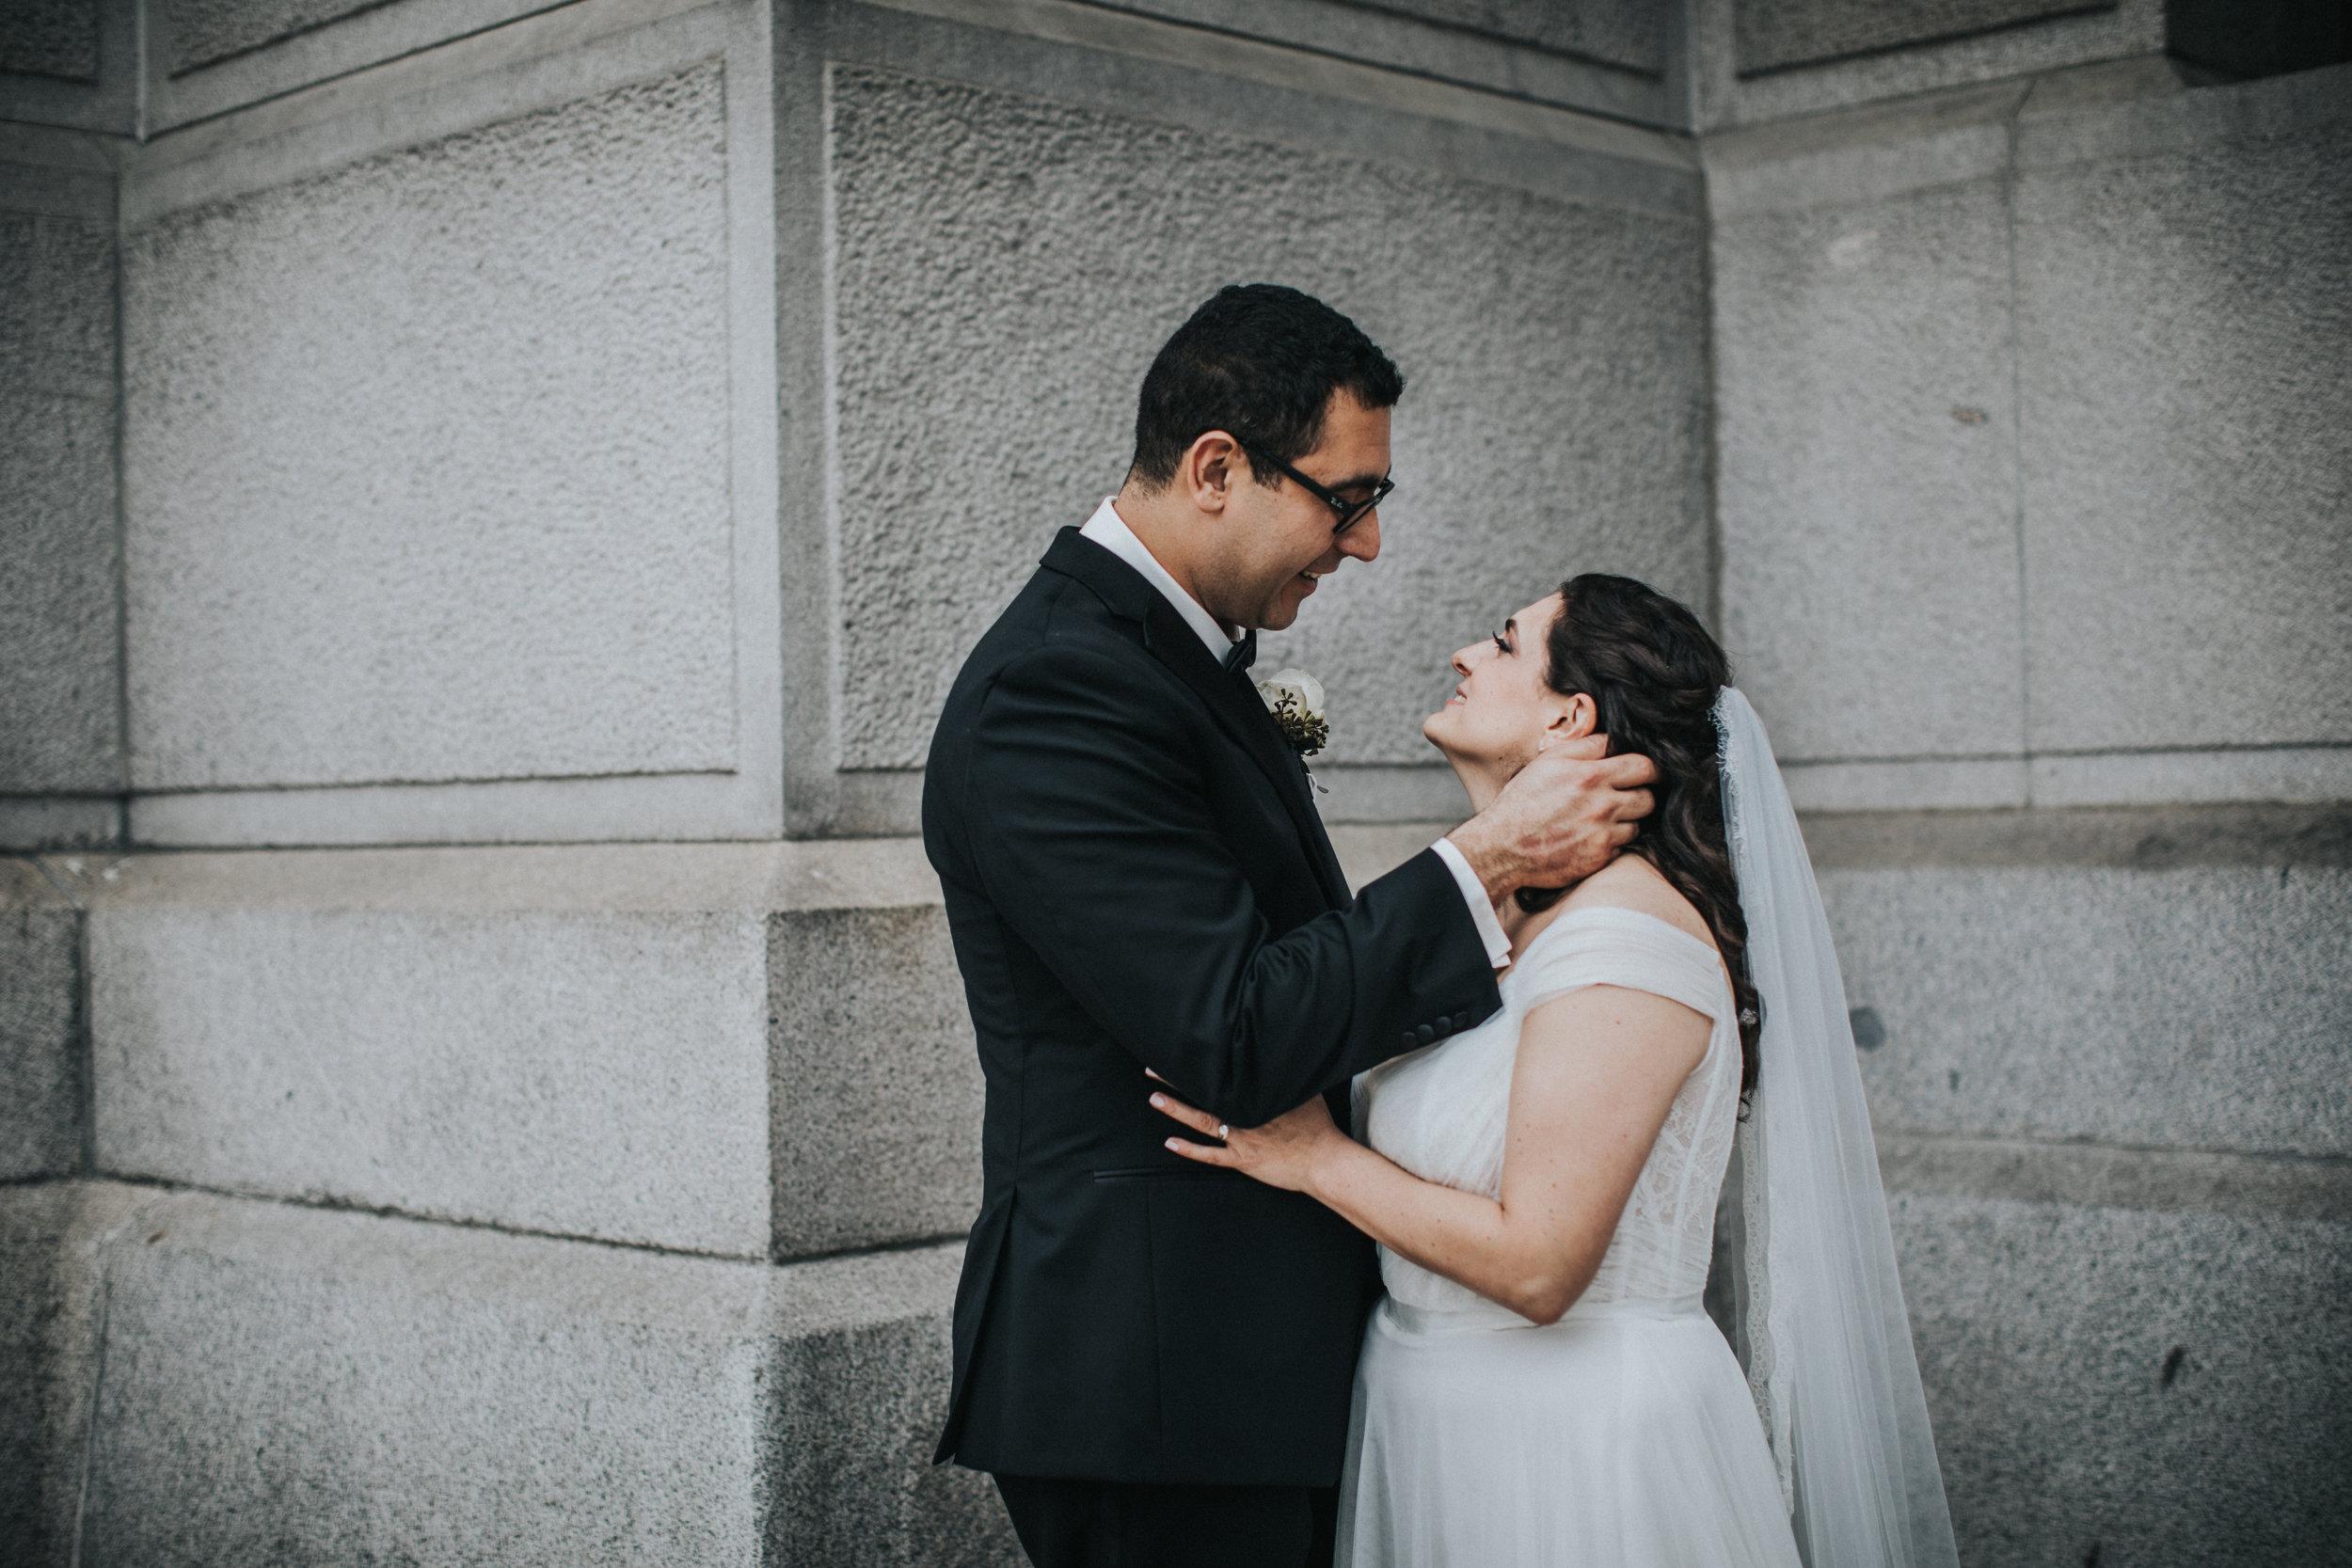 JennaLynnPhotography-NJWeddingPhotographer-Philadelphia-Wedding-ArtsBallroom-BridalParty-17.jpg